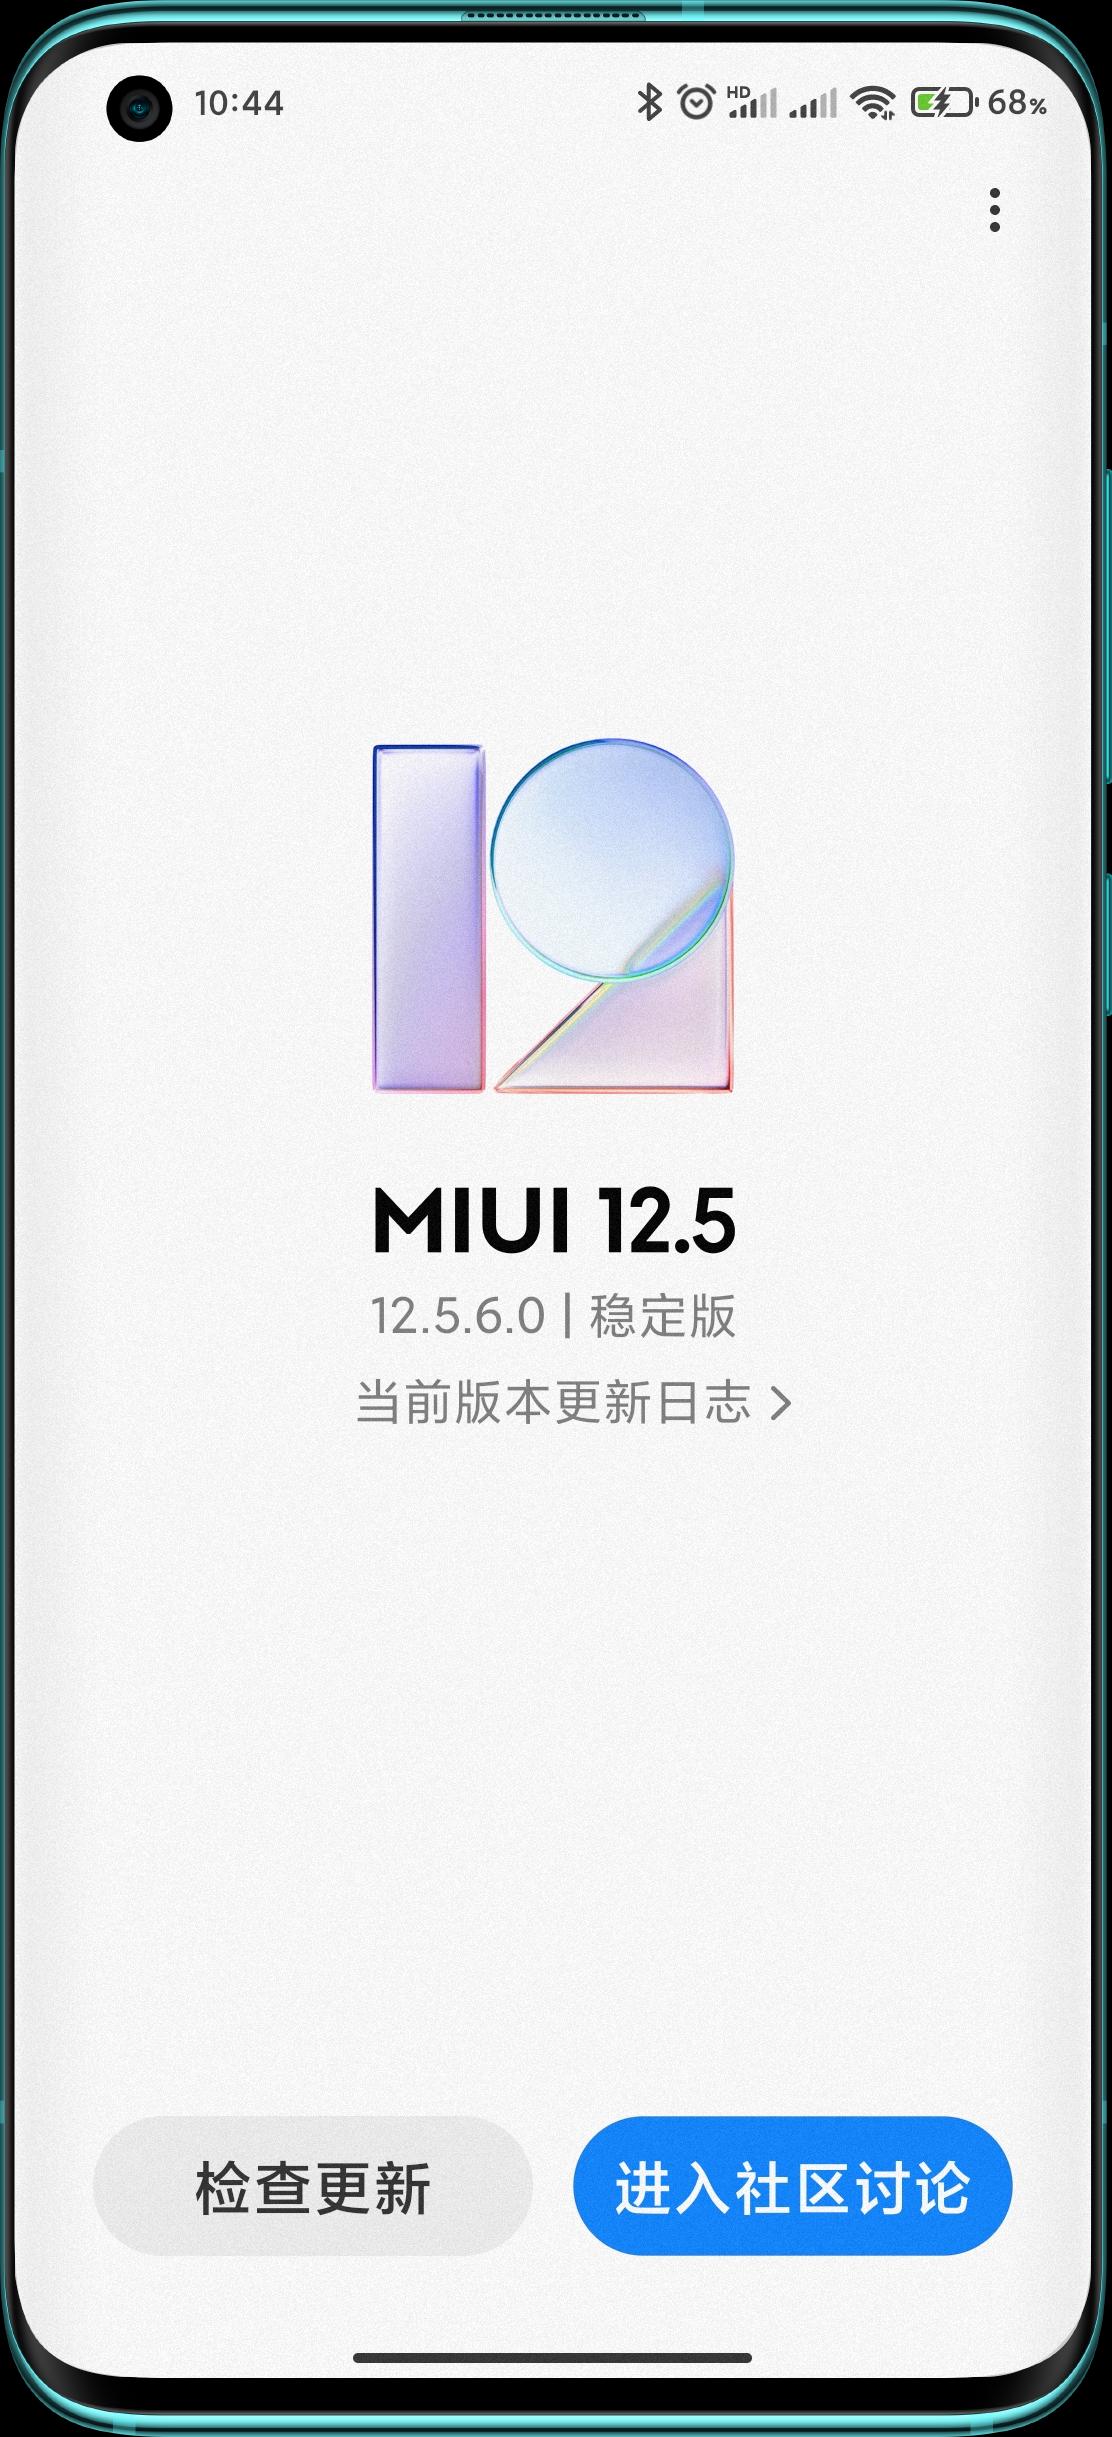 MIUI 12.5 增强版 手动更新教程(以小米10手机为例) - 2067e3c26a444f5d9b82df1bf9d568d7